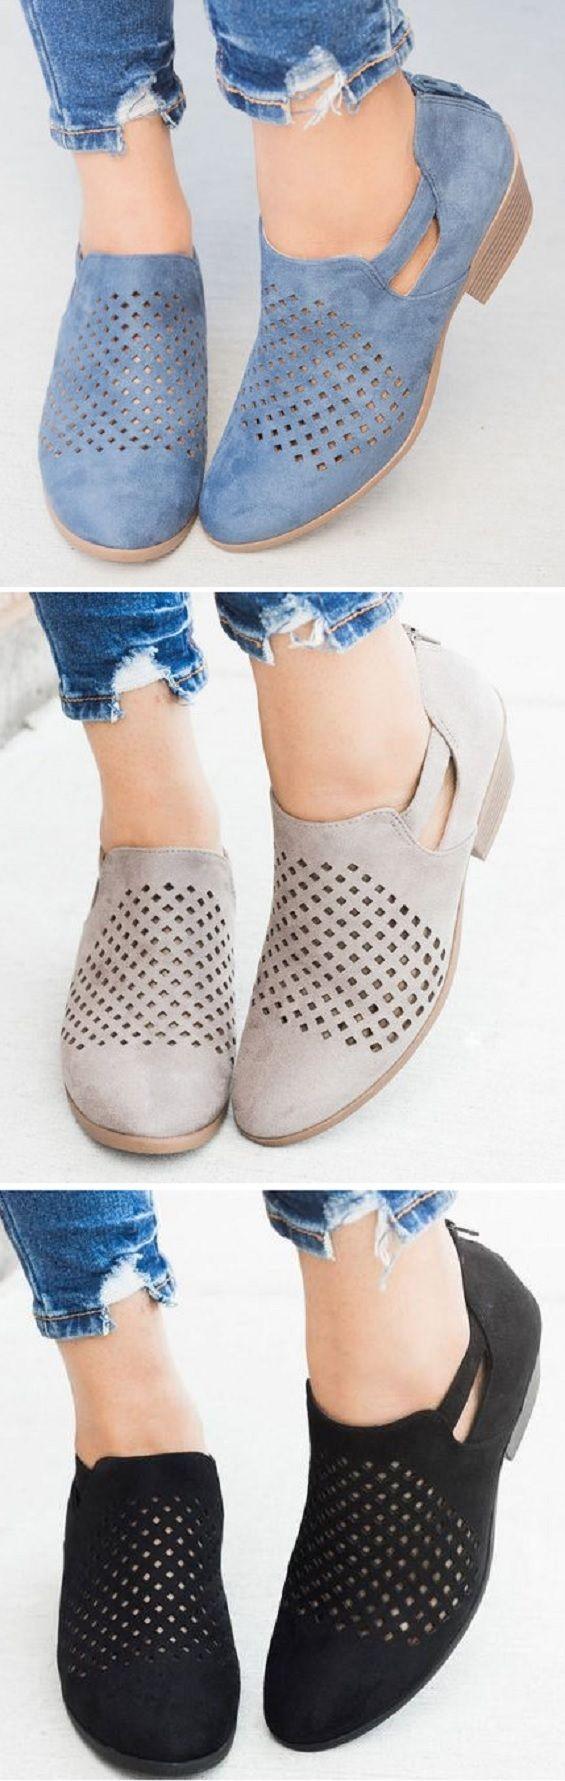 Pin on Big girl shoes